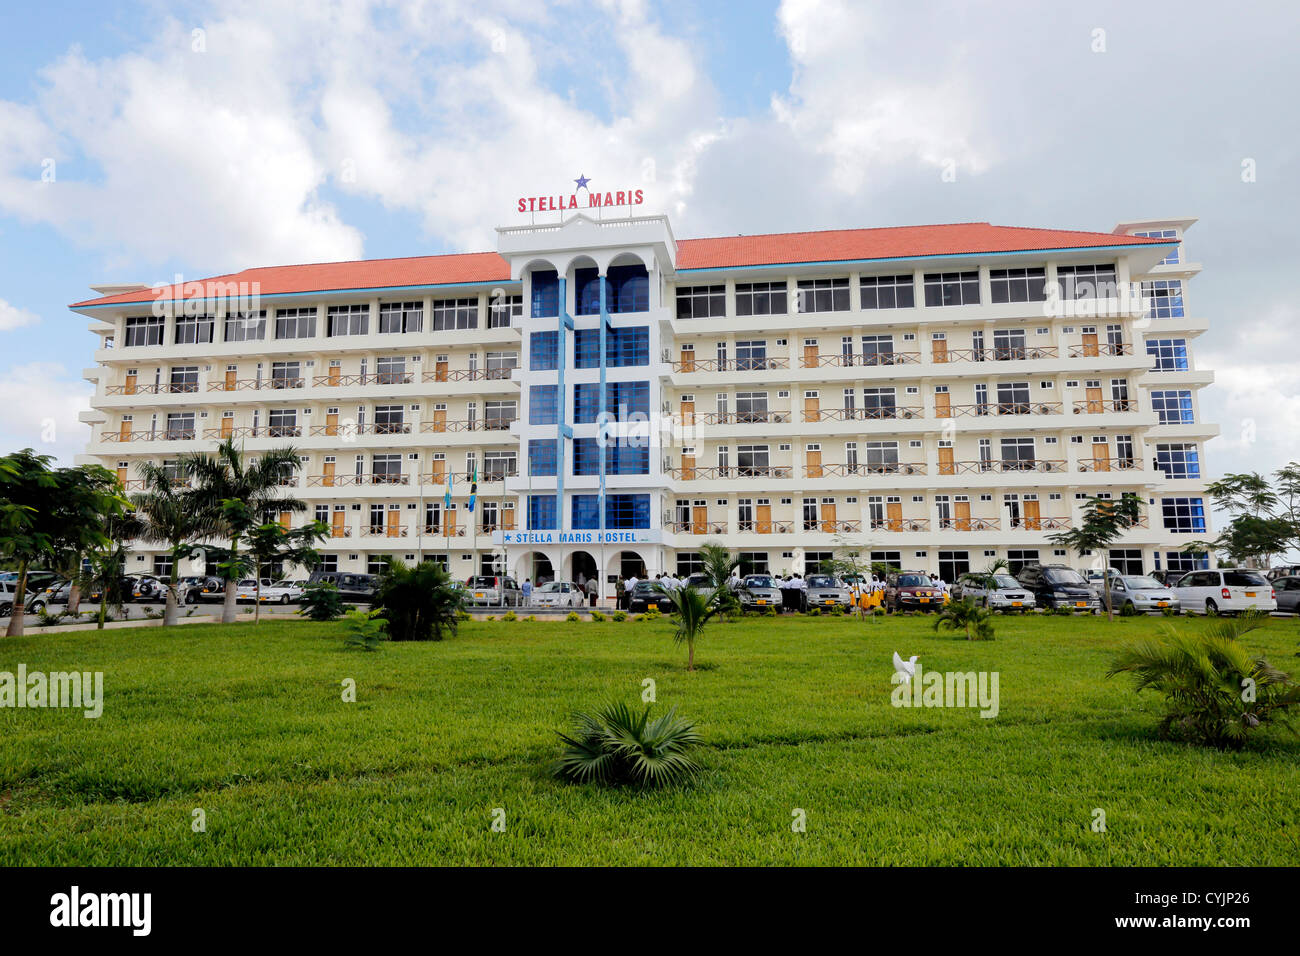 Stella Maris Hostel in Bagamoyo, Tanzania - Stock Image